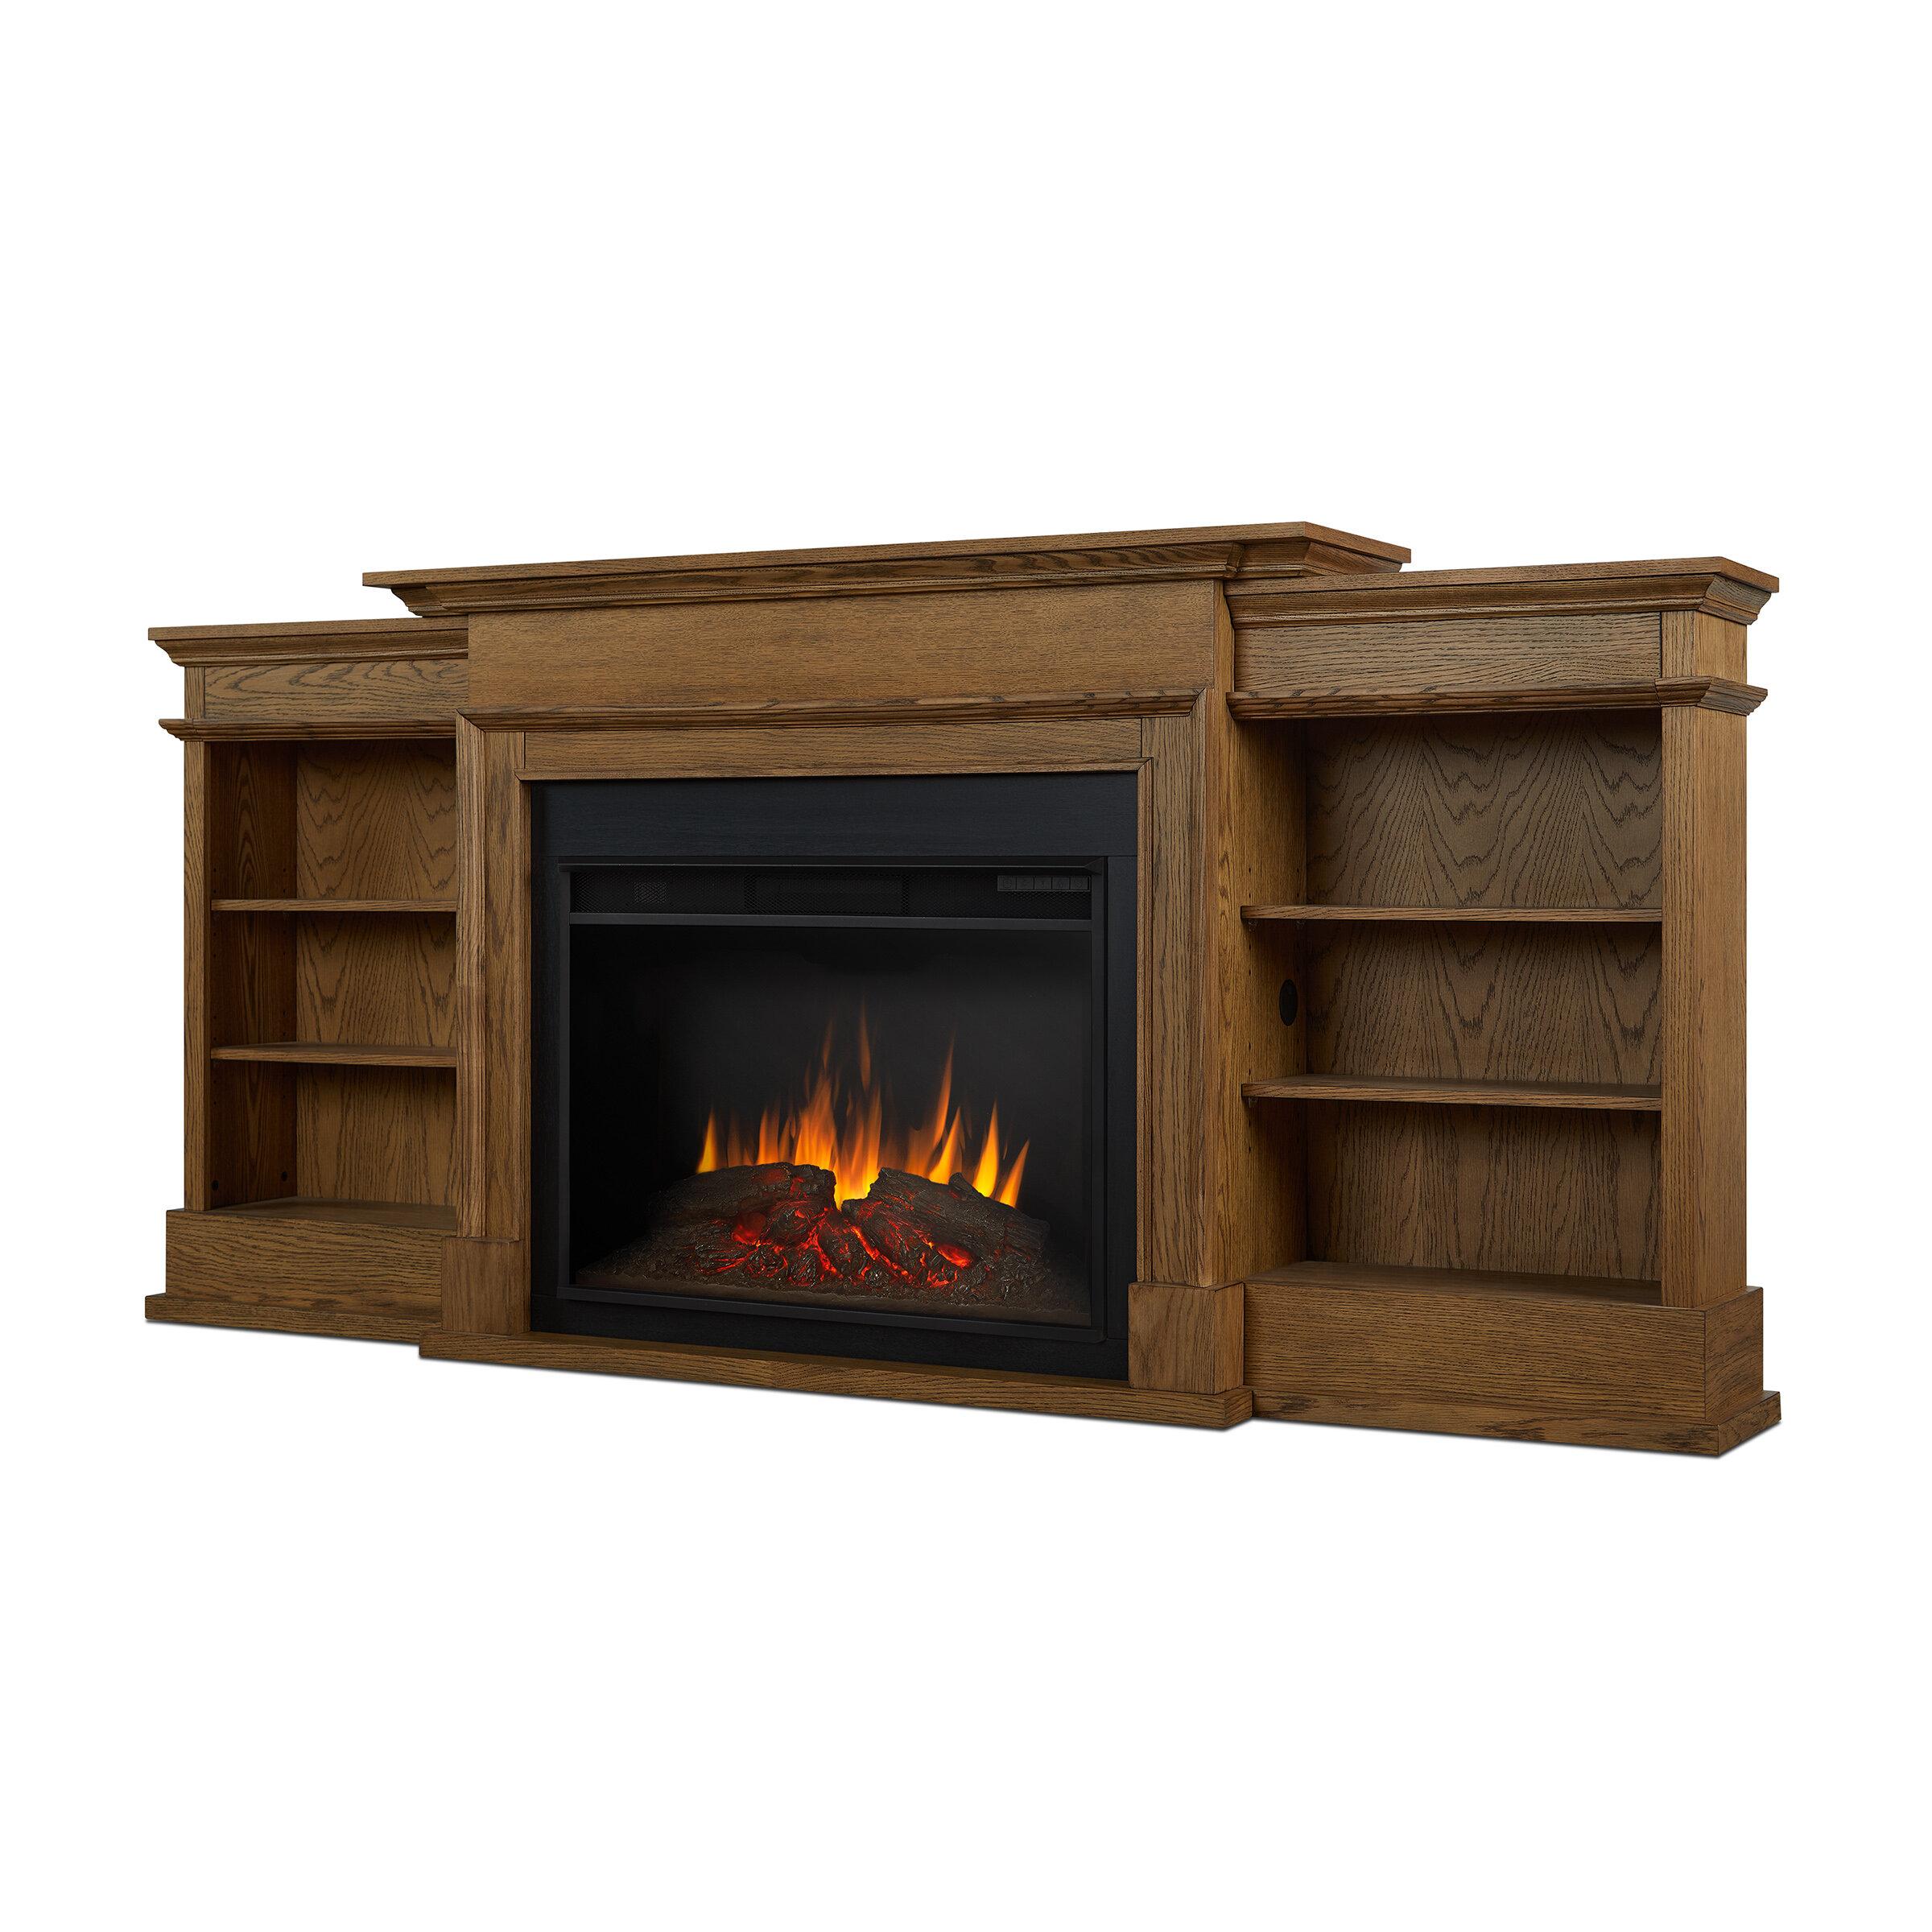 Real Flame Ashton Grand Media Electric Fireplace Reviews Wayfair